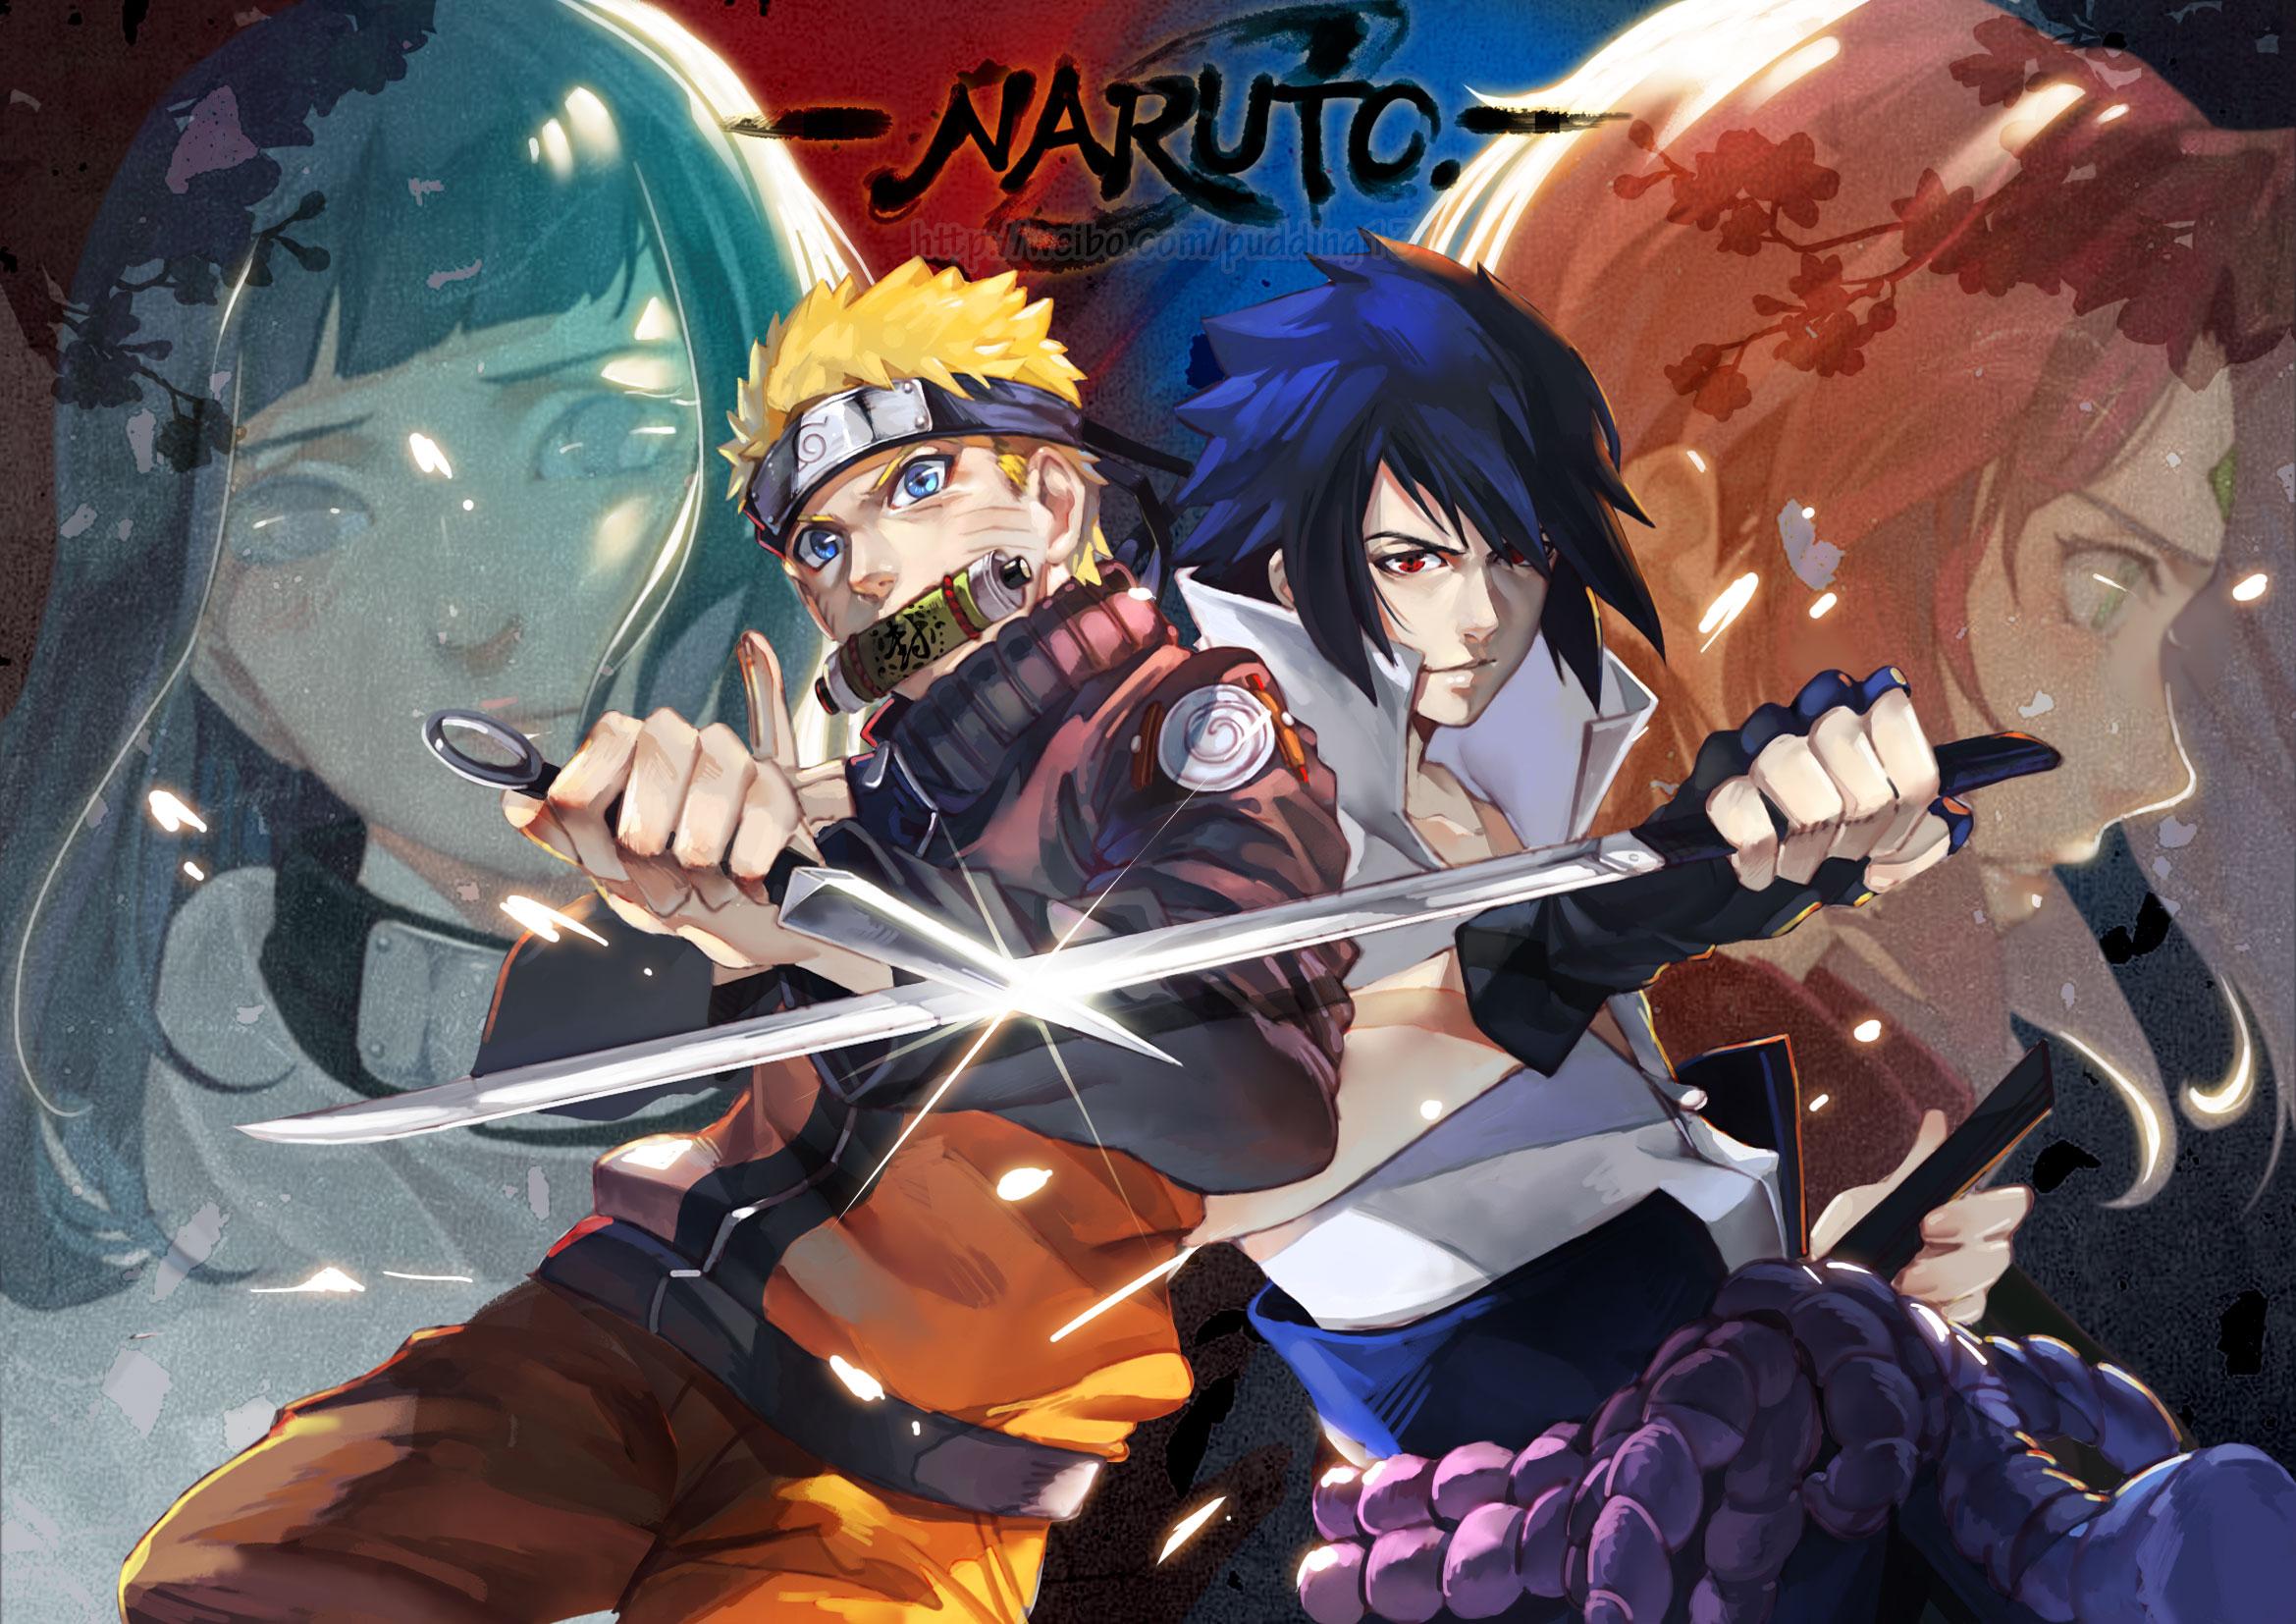 Naruto Hd Wallpaper Background Image 2339x1654 Id 692080